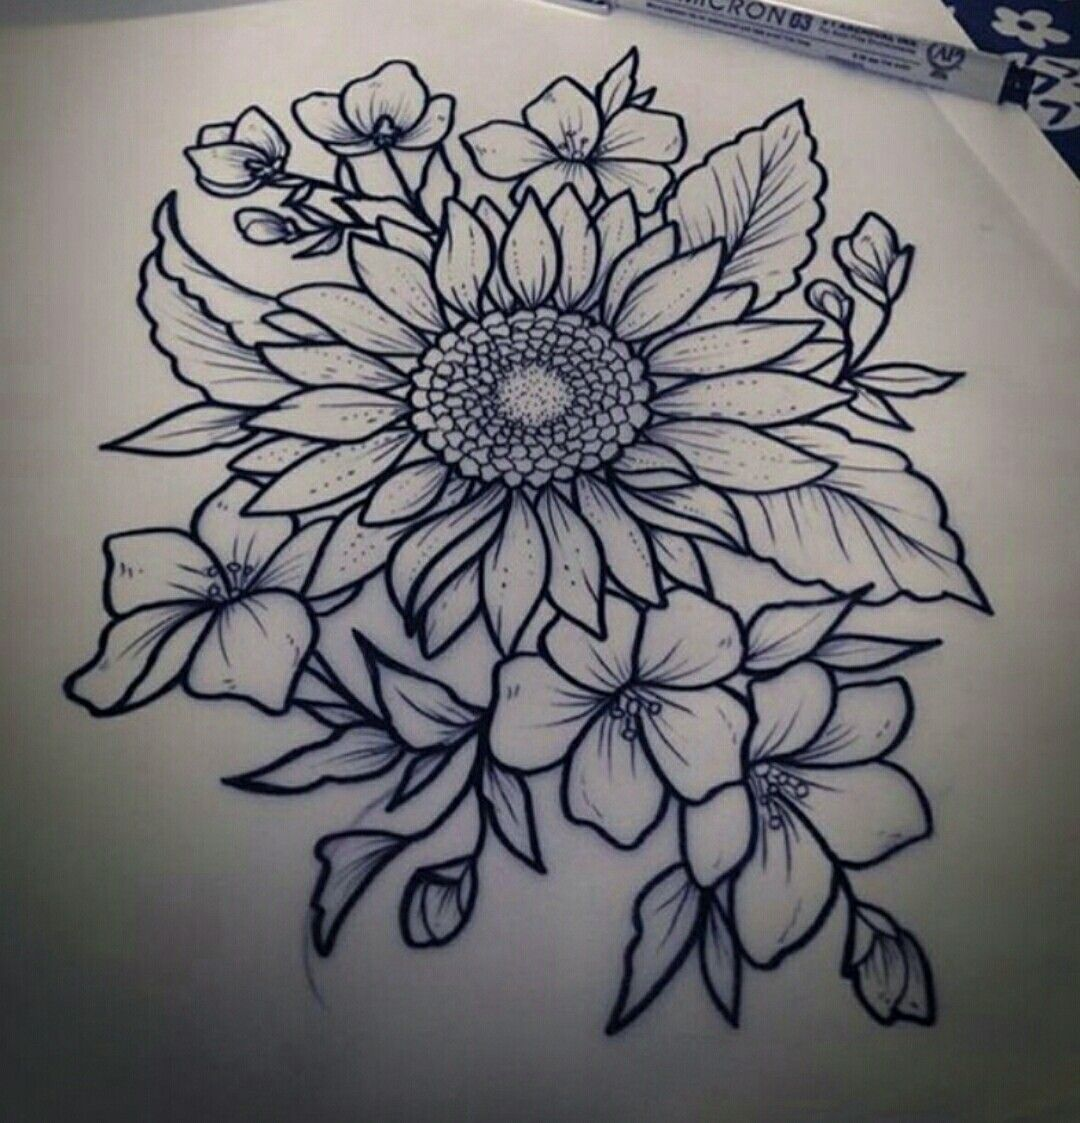 Sunflower drawing Inspirational tattoos, Flower tattoo